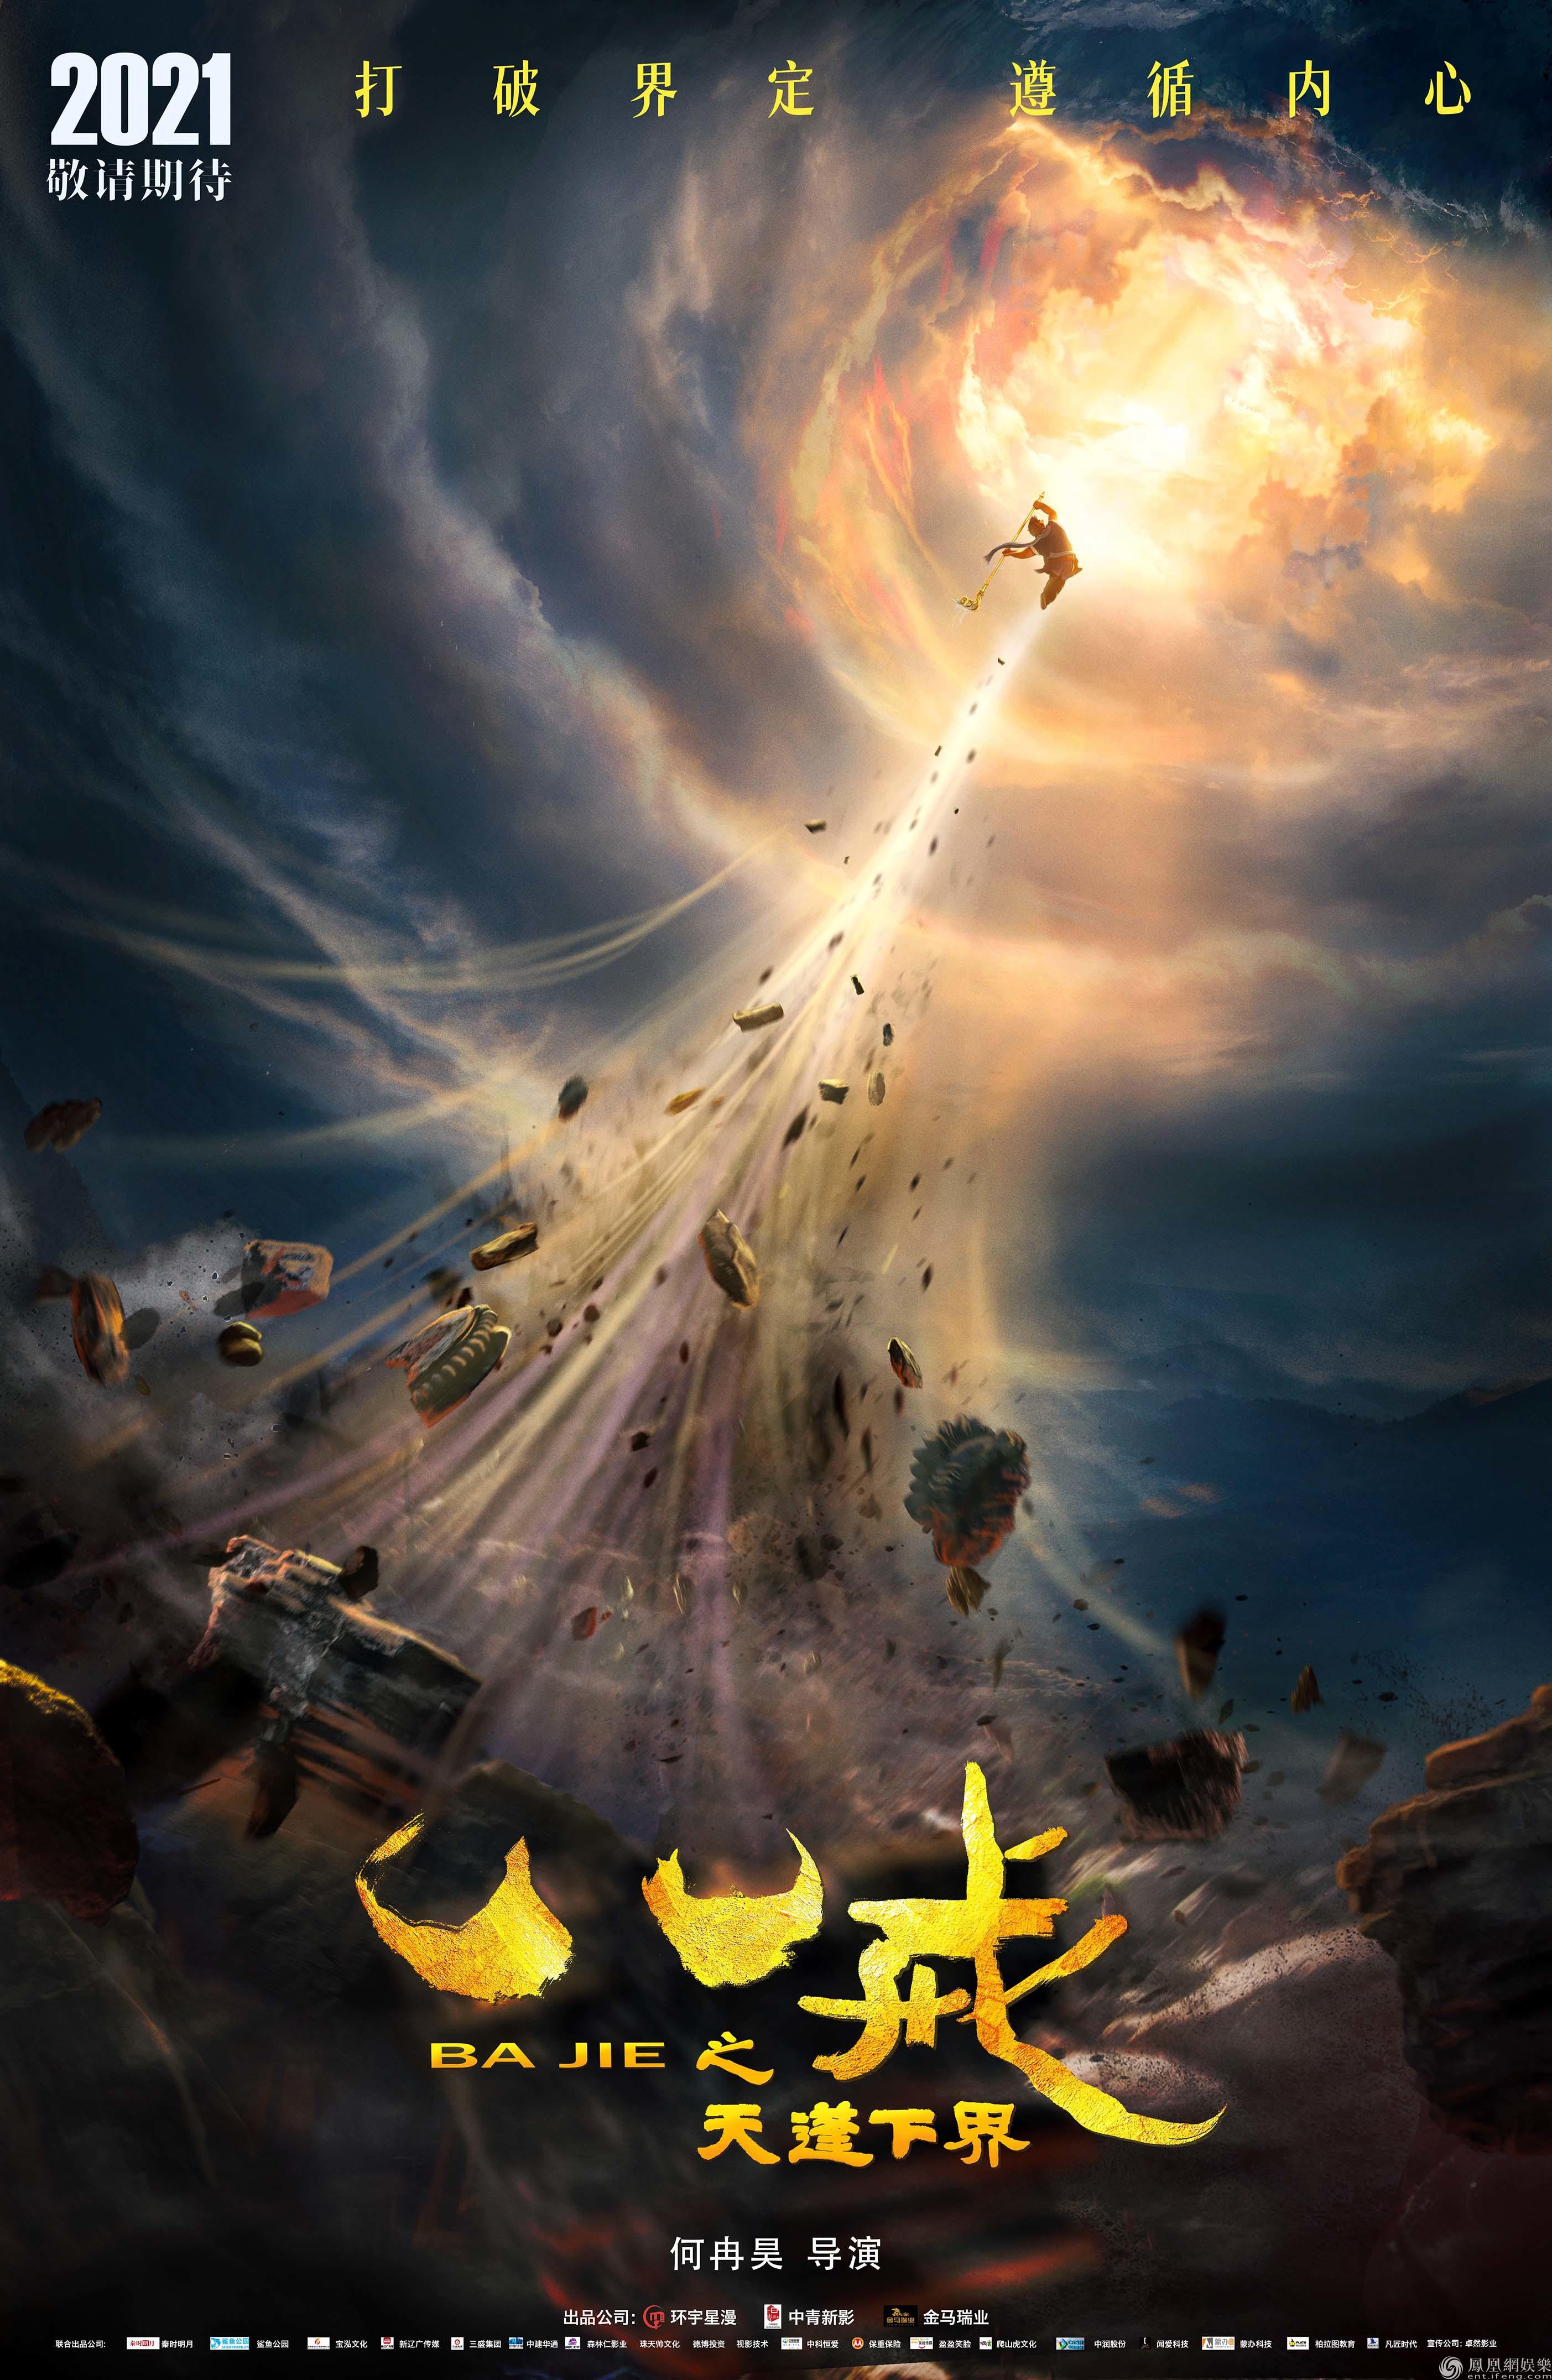 3D动画电影《八戒之天蓬下界》概念海报6月18日曝光 憨厚暖男为爱勇敢